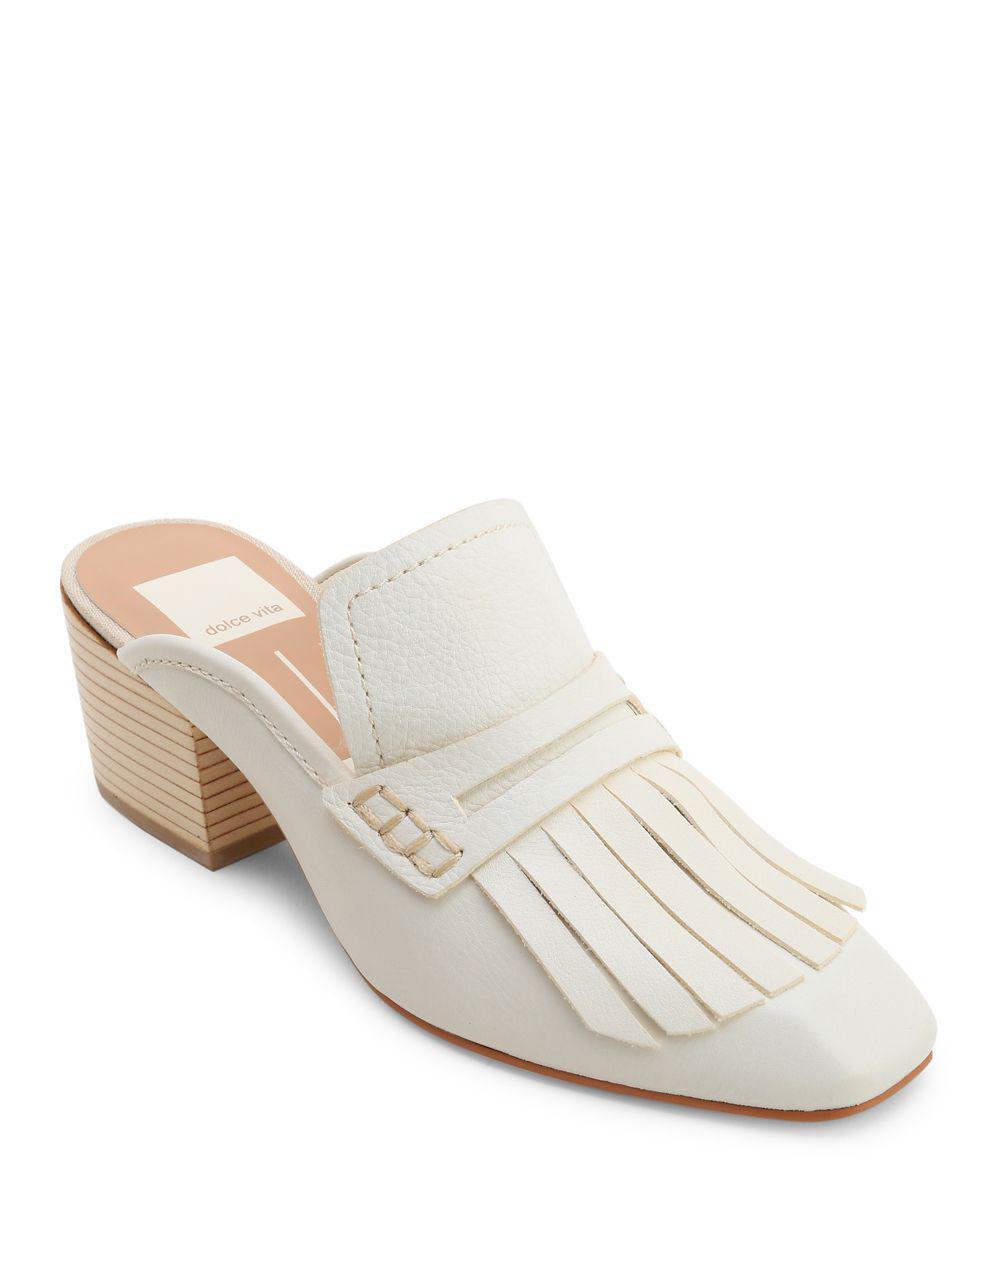 Dolce Vita Women's Katina Leather Block Heel Mules MpmoSkGdGM